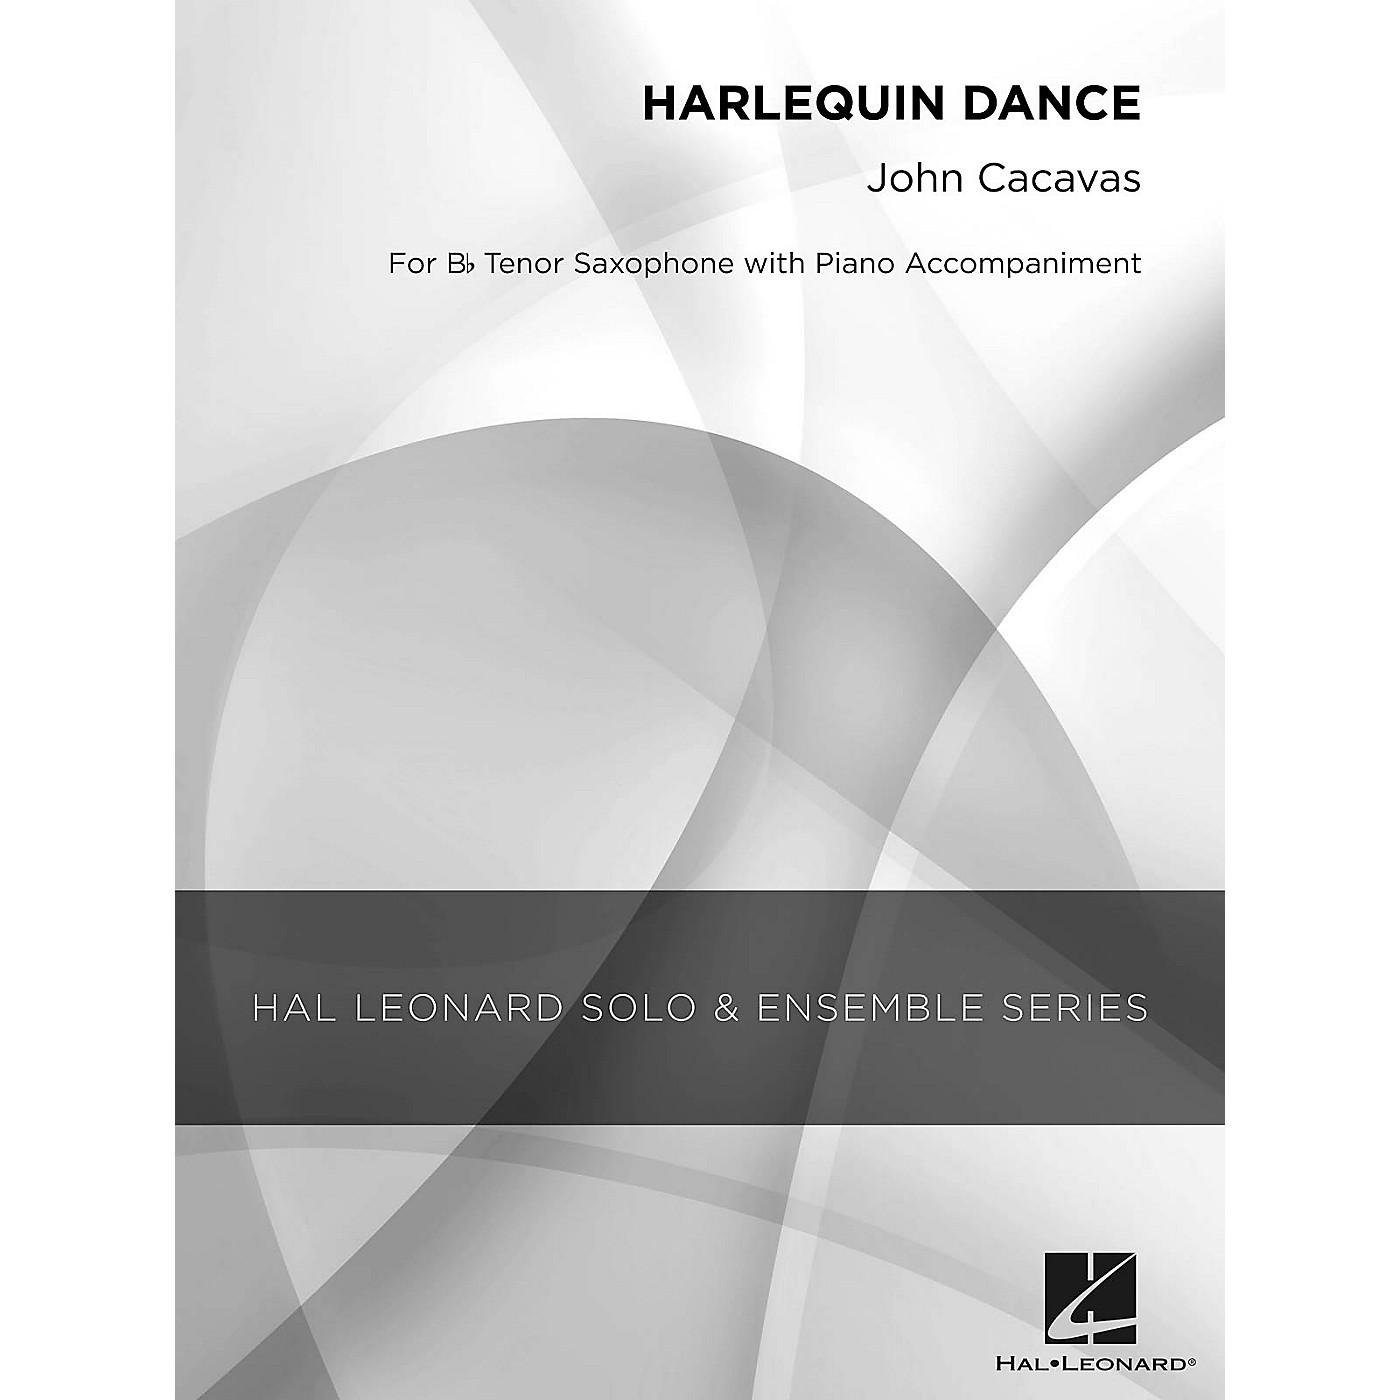 Hal Leonard Harlequin Dance (Grade 2 Tenor Saxophone Solo) Concert Band Level 2 Composed by John Cacavas thumbnail